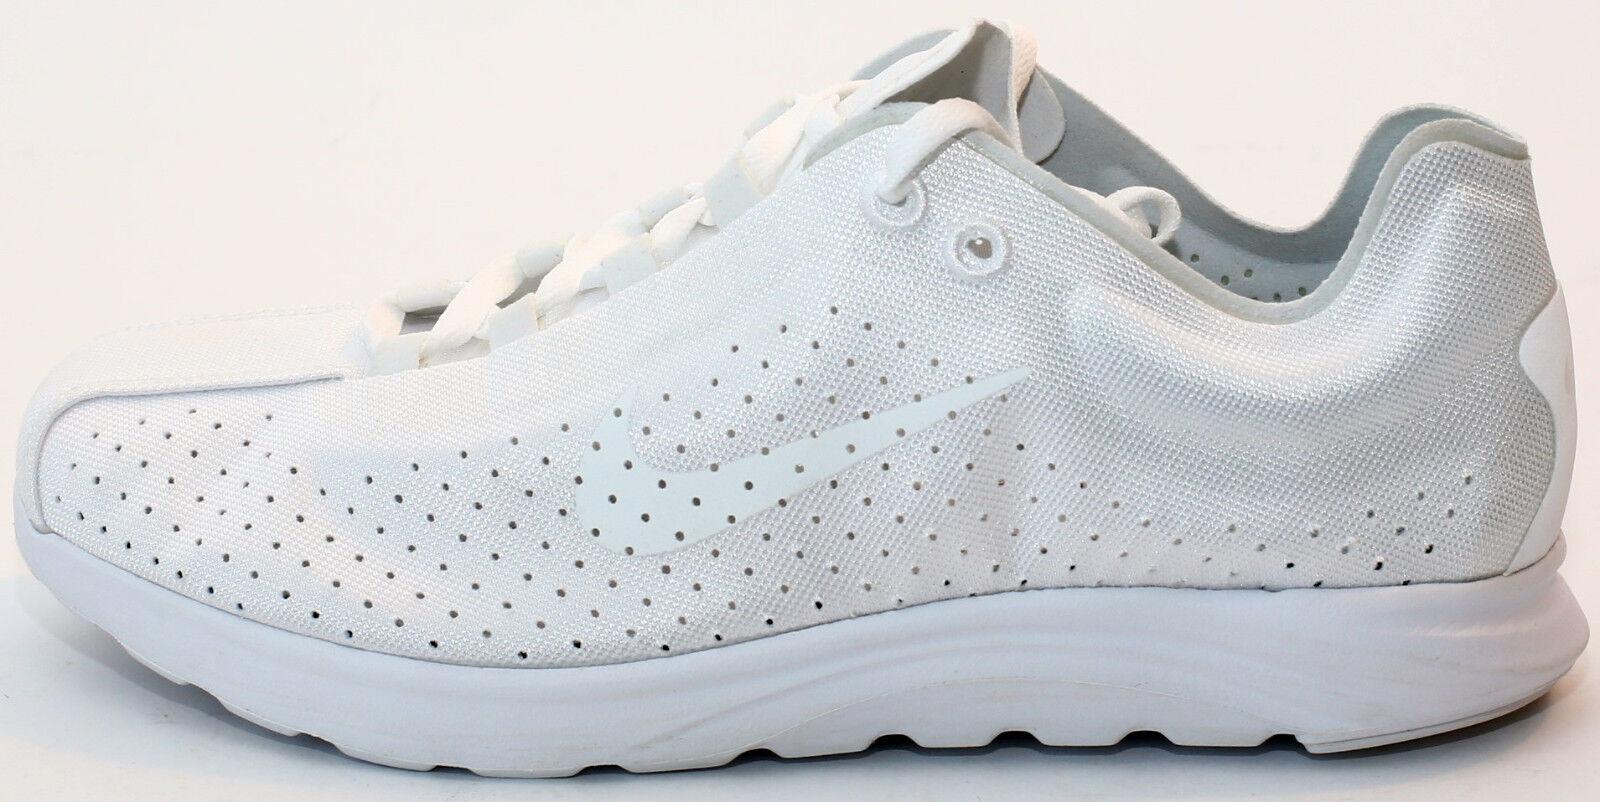 Nike 898027100 Turnschuhe Mayfly Lite BR Sneaker Turnschuhe 898027100 - Größe 46 - Weiß - Neu (F) ef5068